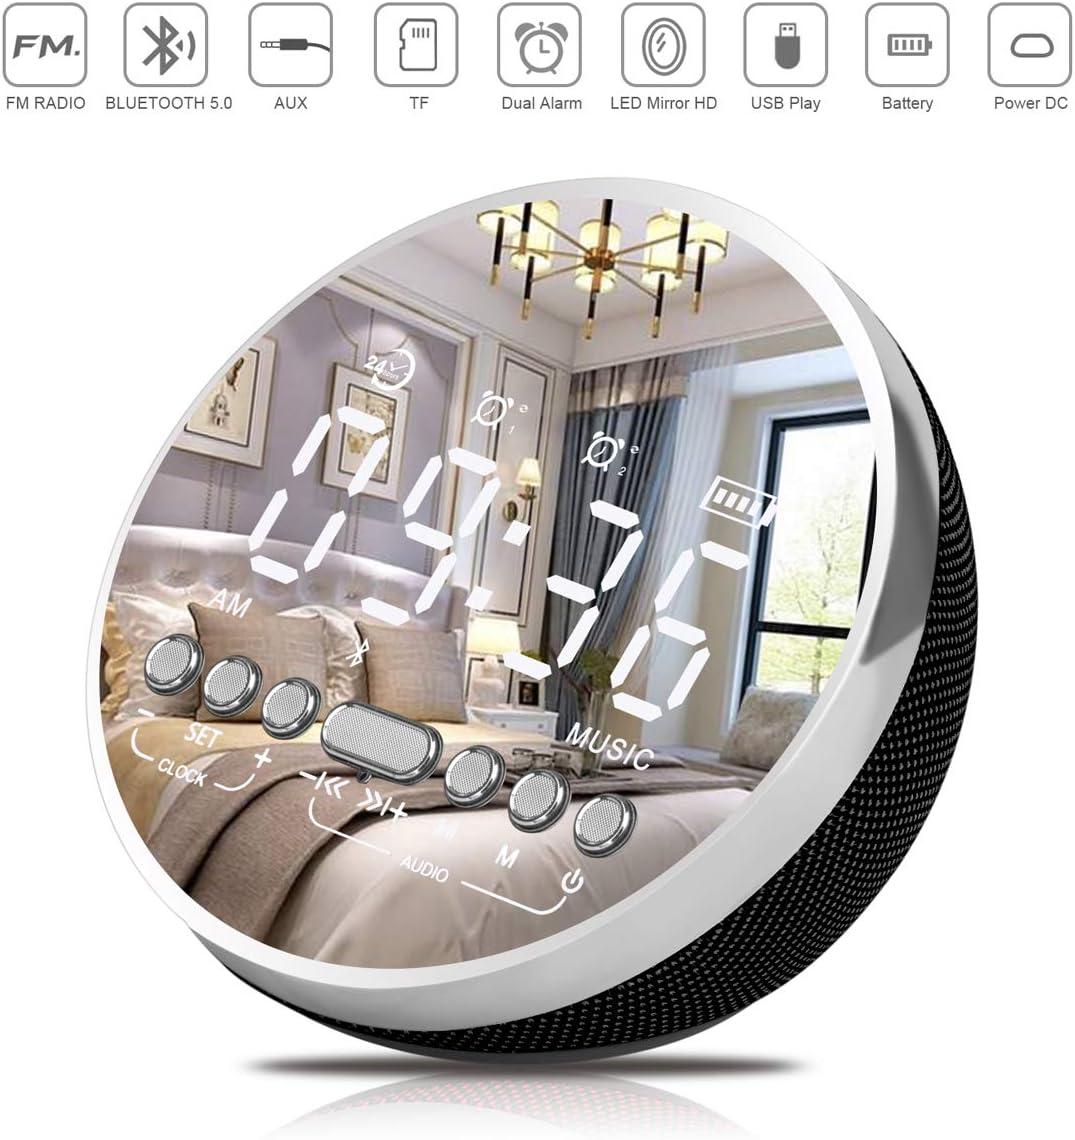 MENESO Alarm Clock Radio with FM Radio, Digital Alarm Clock Speaker,LED Alarm Clock for Bedrooms and Battery Backup and USB Port Charging Newest Version Black